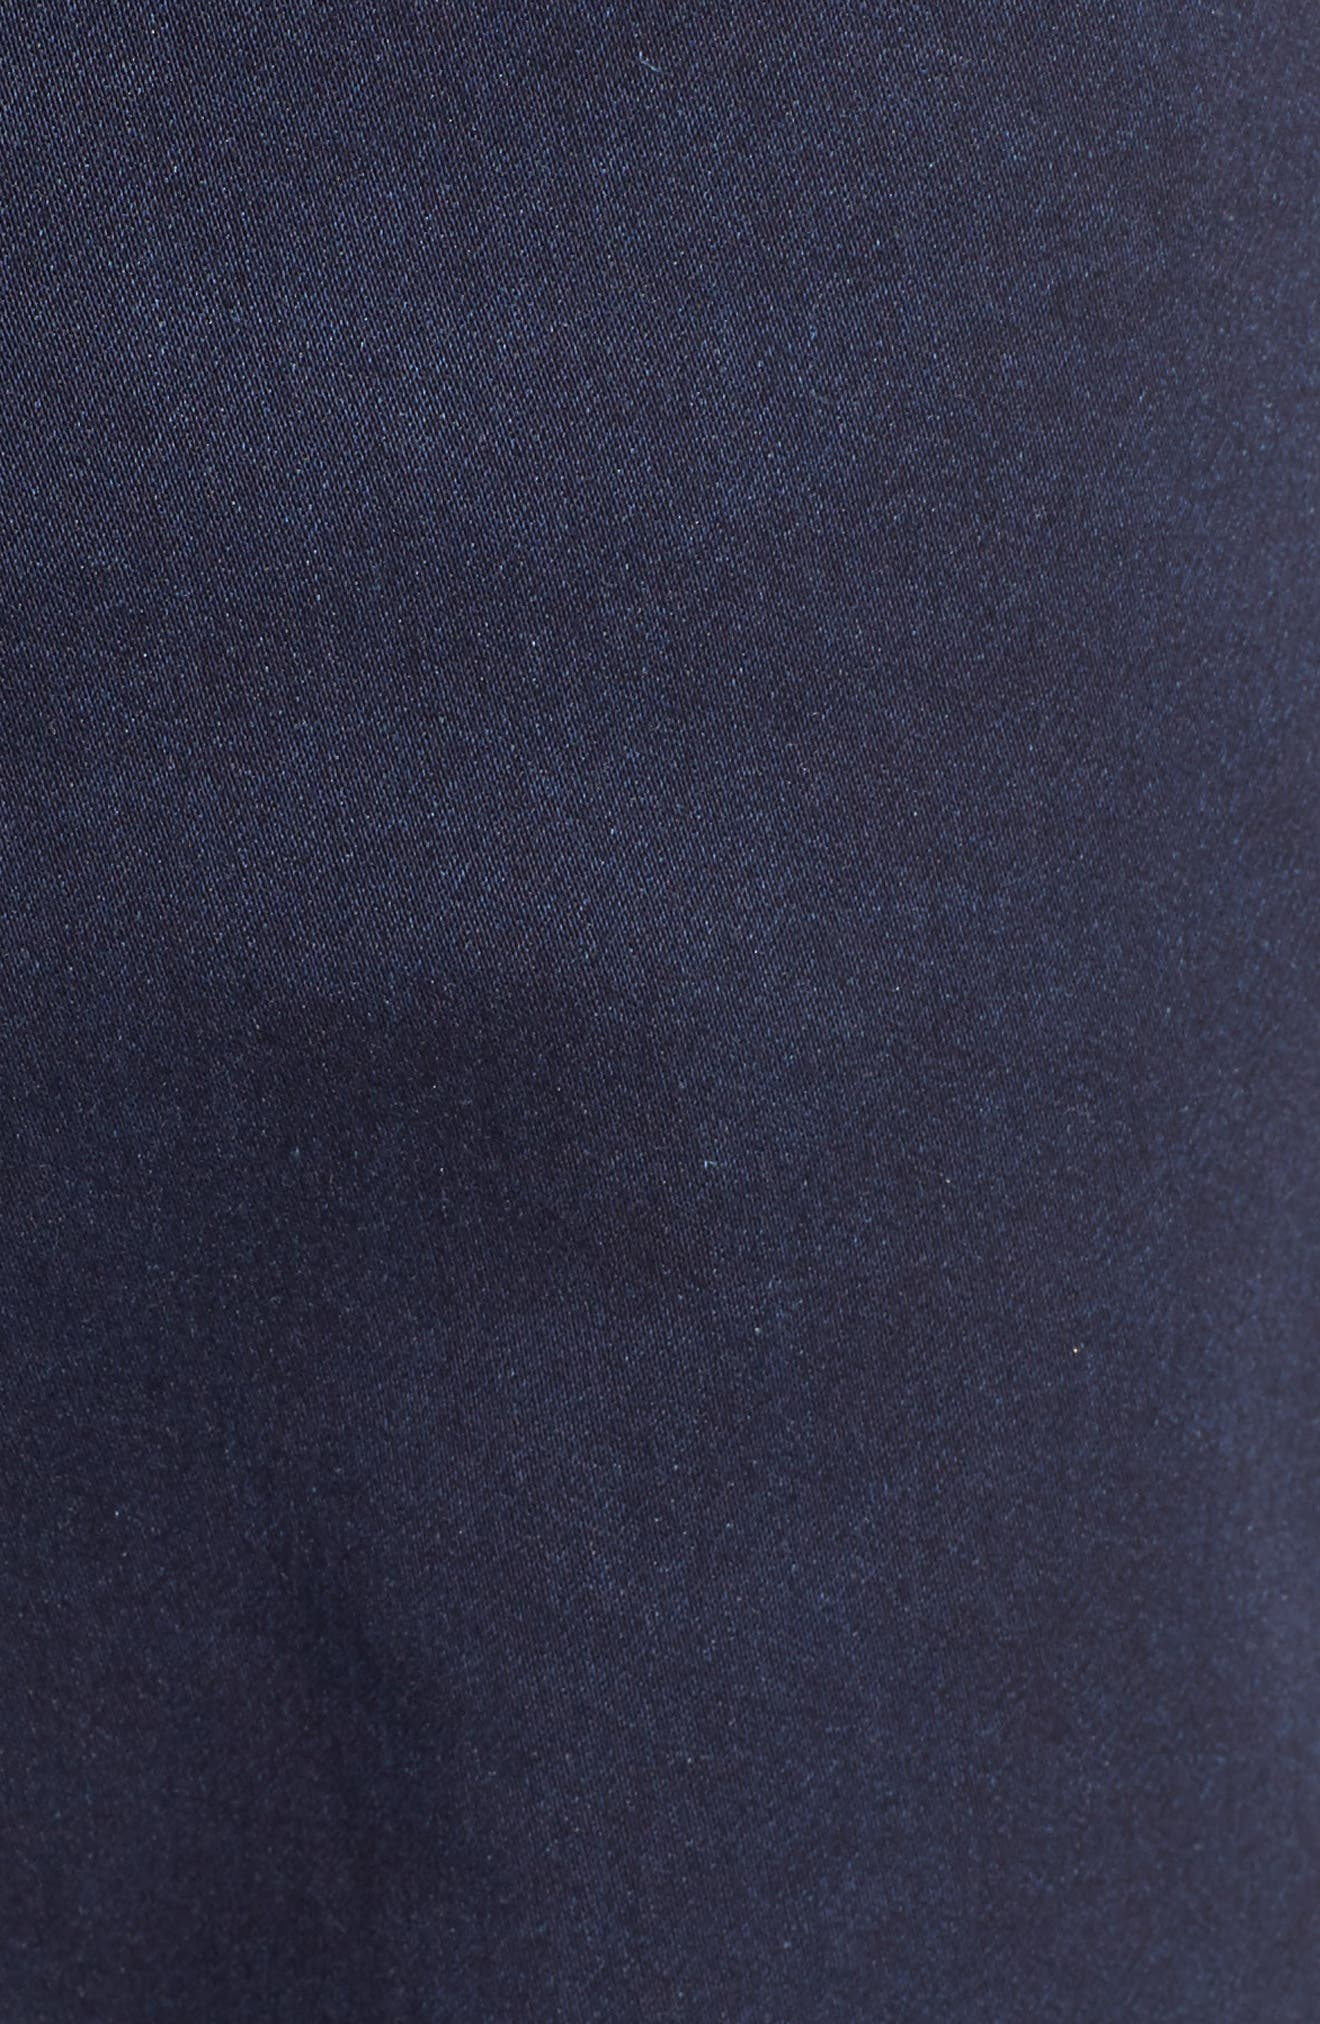 Slim Straight Leg Pants,                             Alternate thumbnail 5, color,                             462